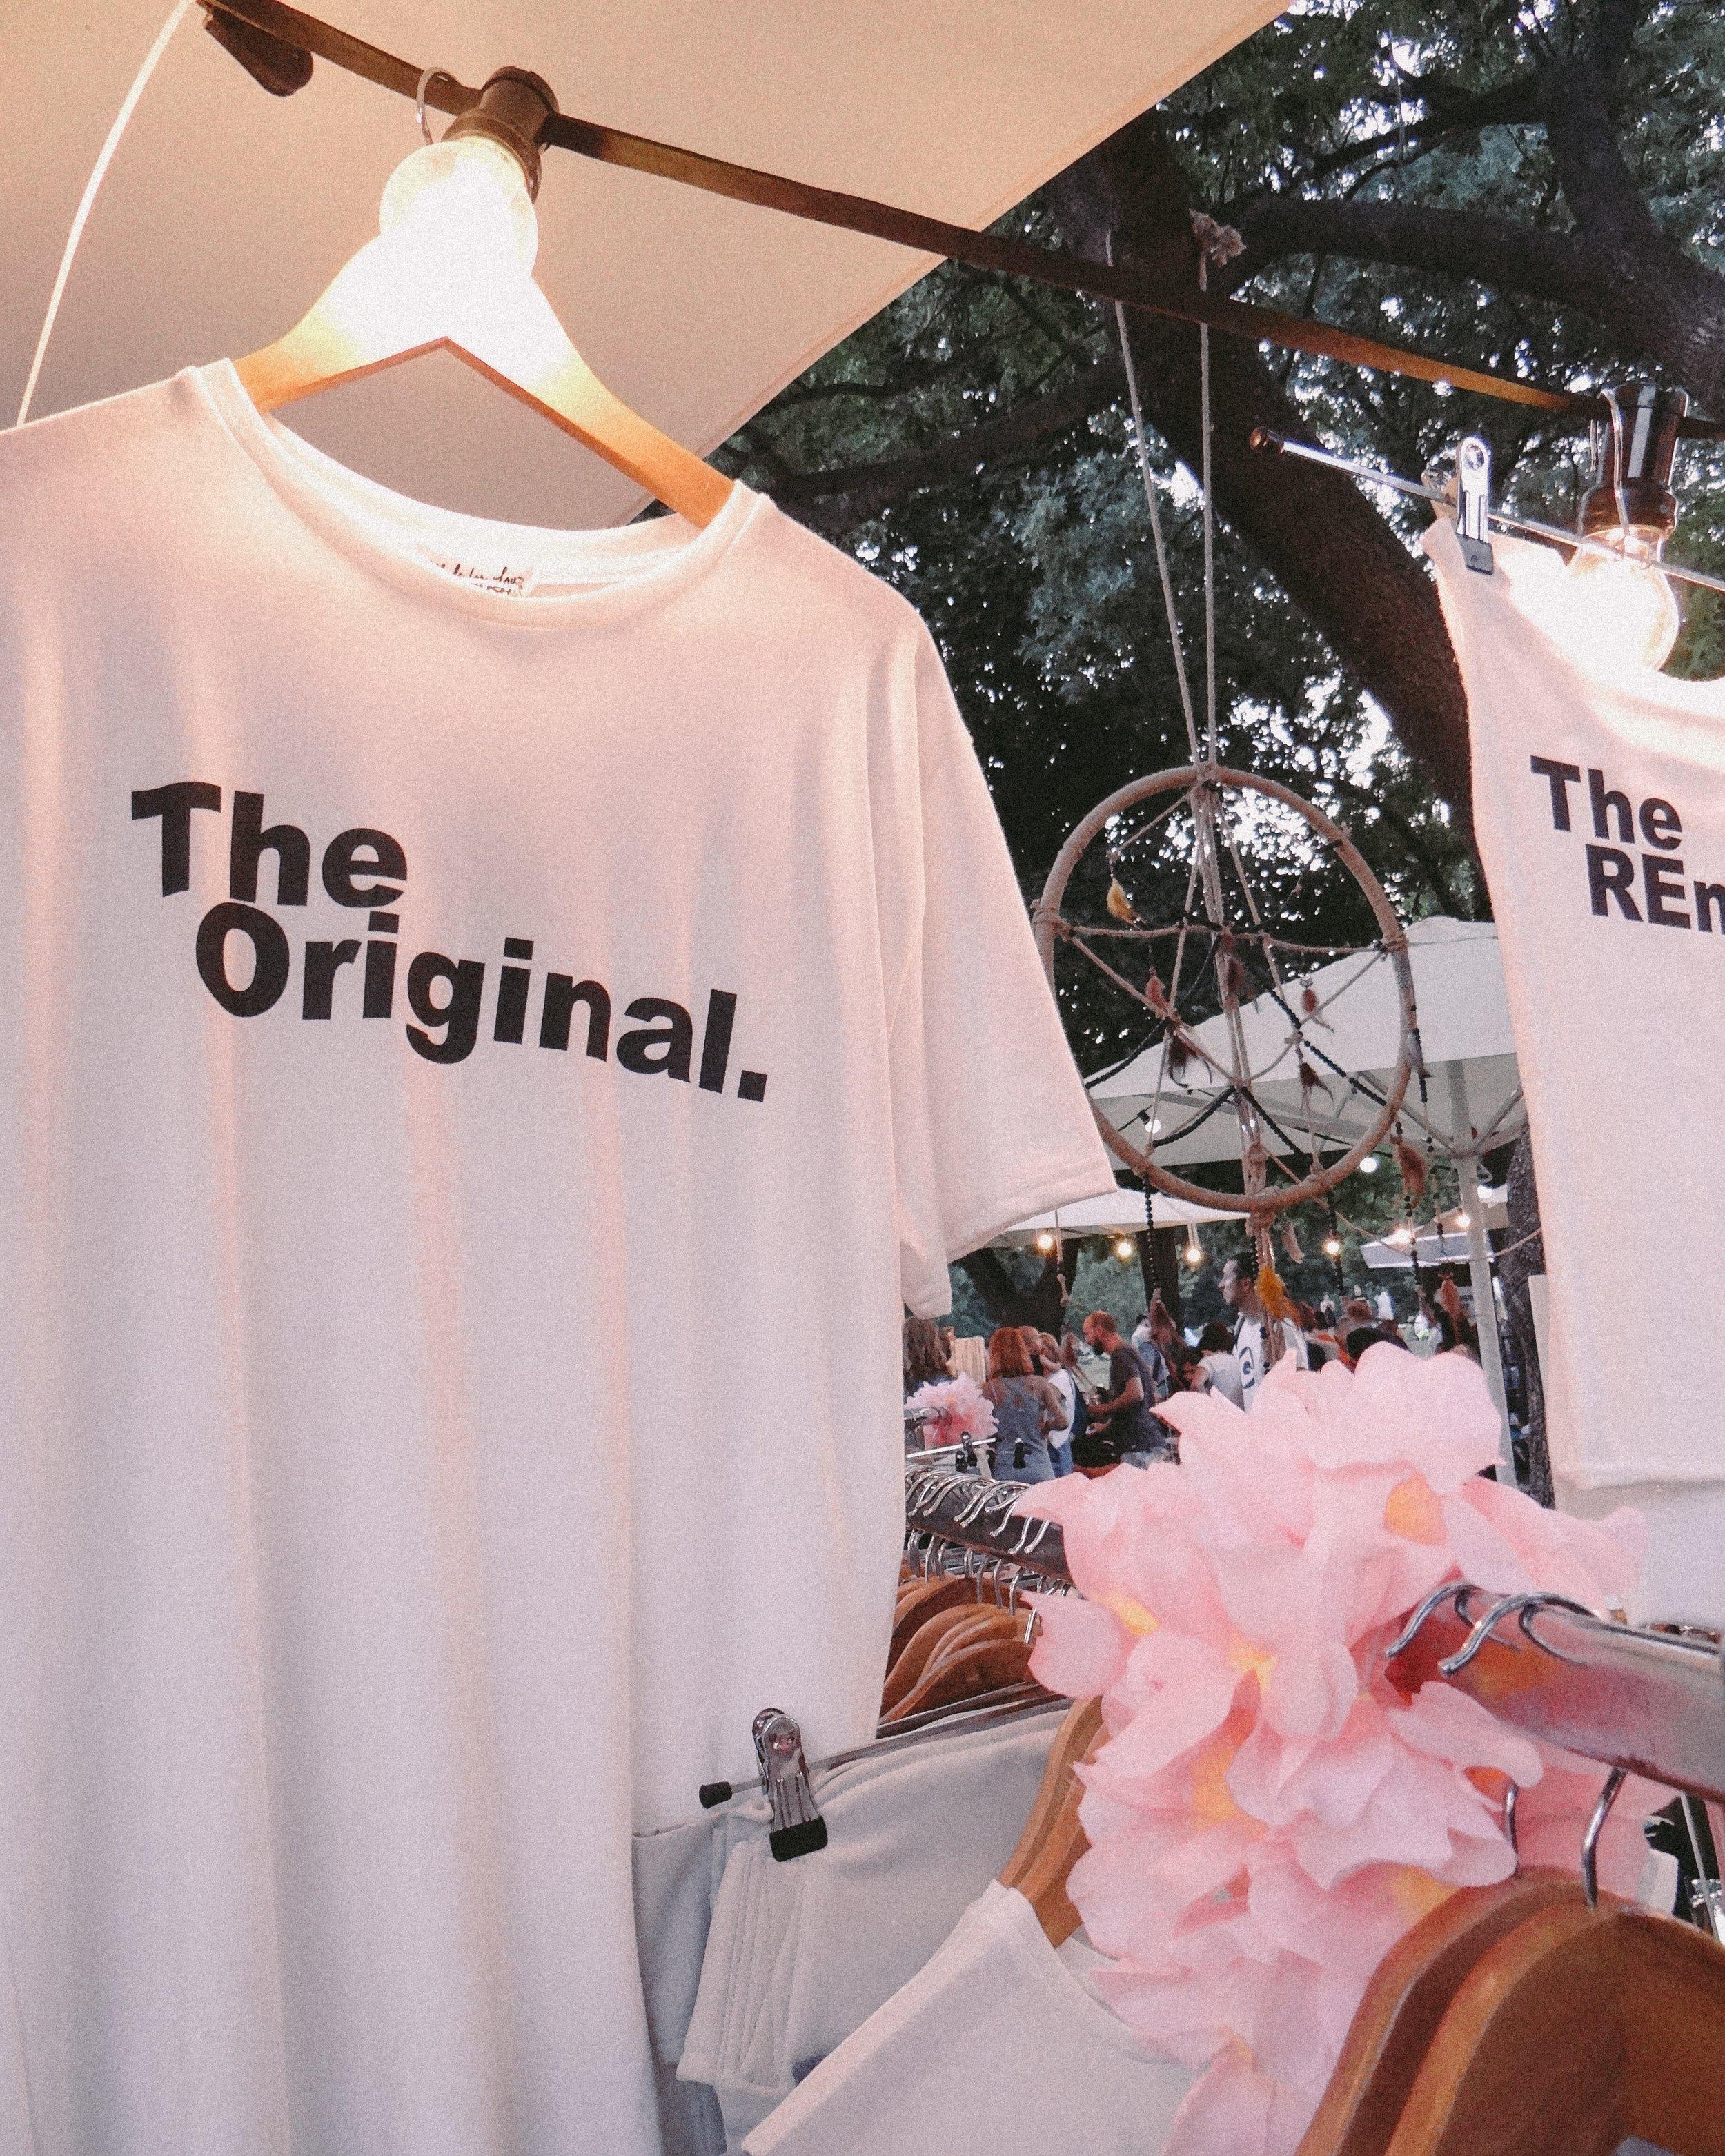 t-shirt-printing-creating-design.jpg